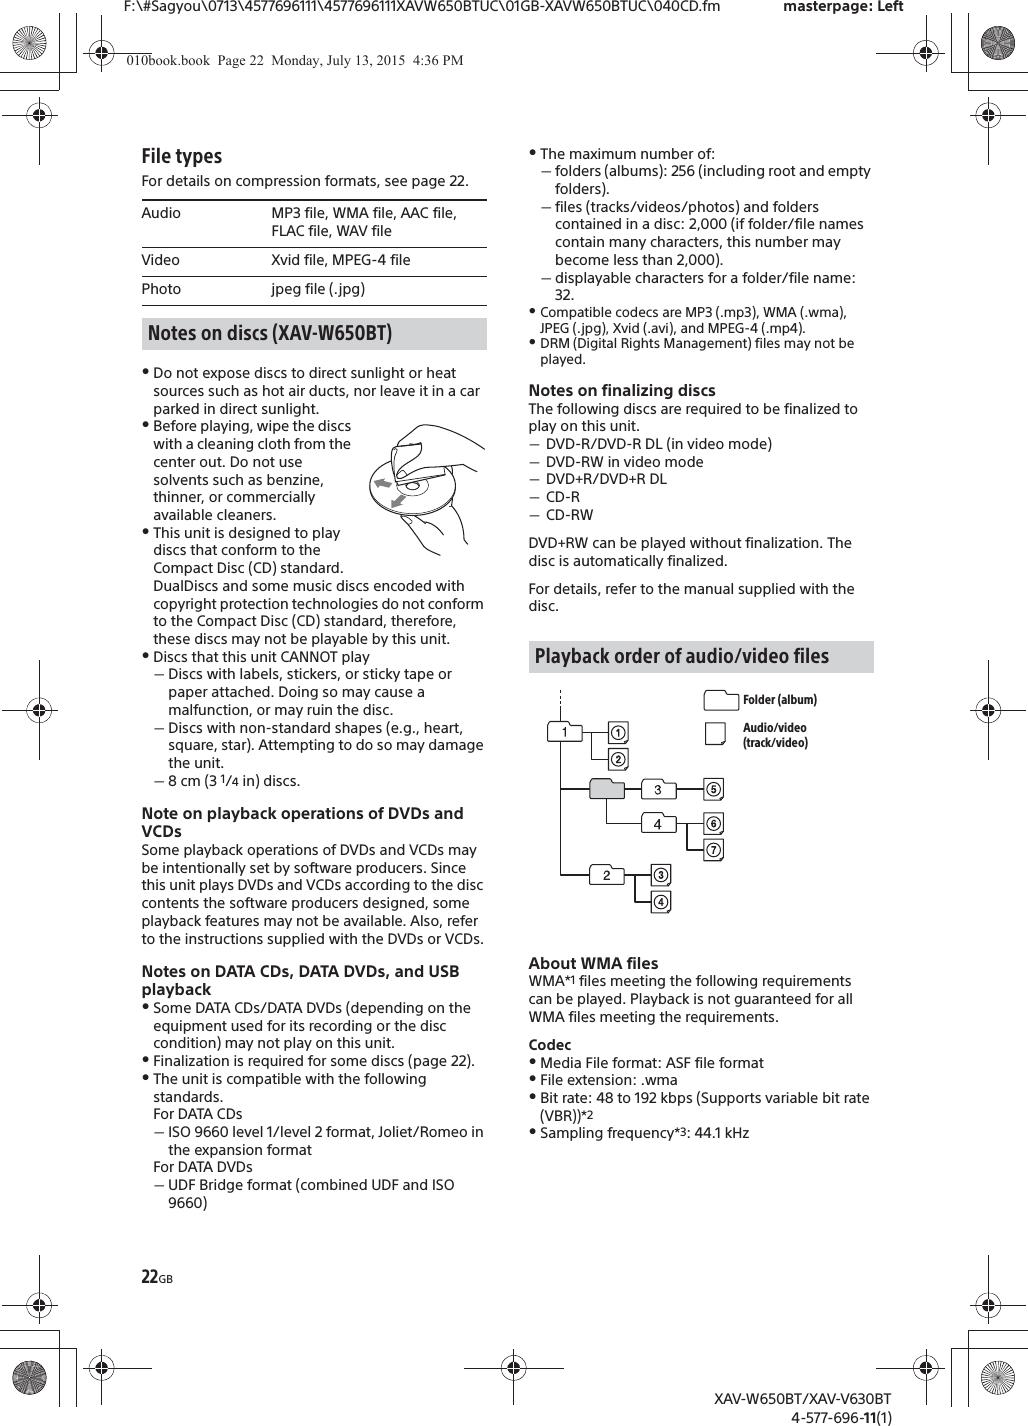 Sony Xav Fm Digital Manual Guide